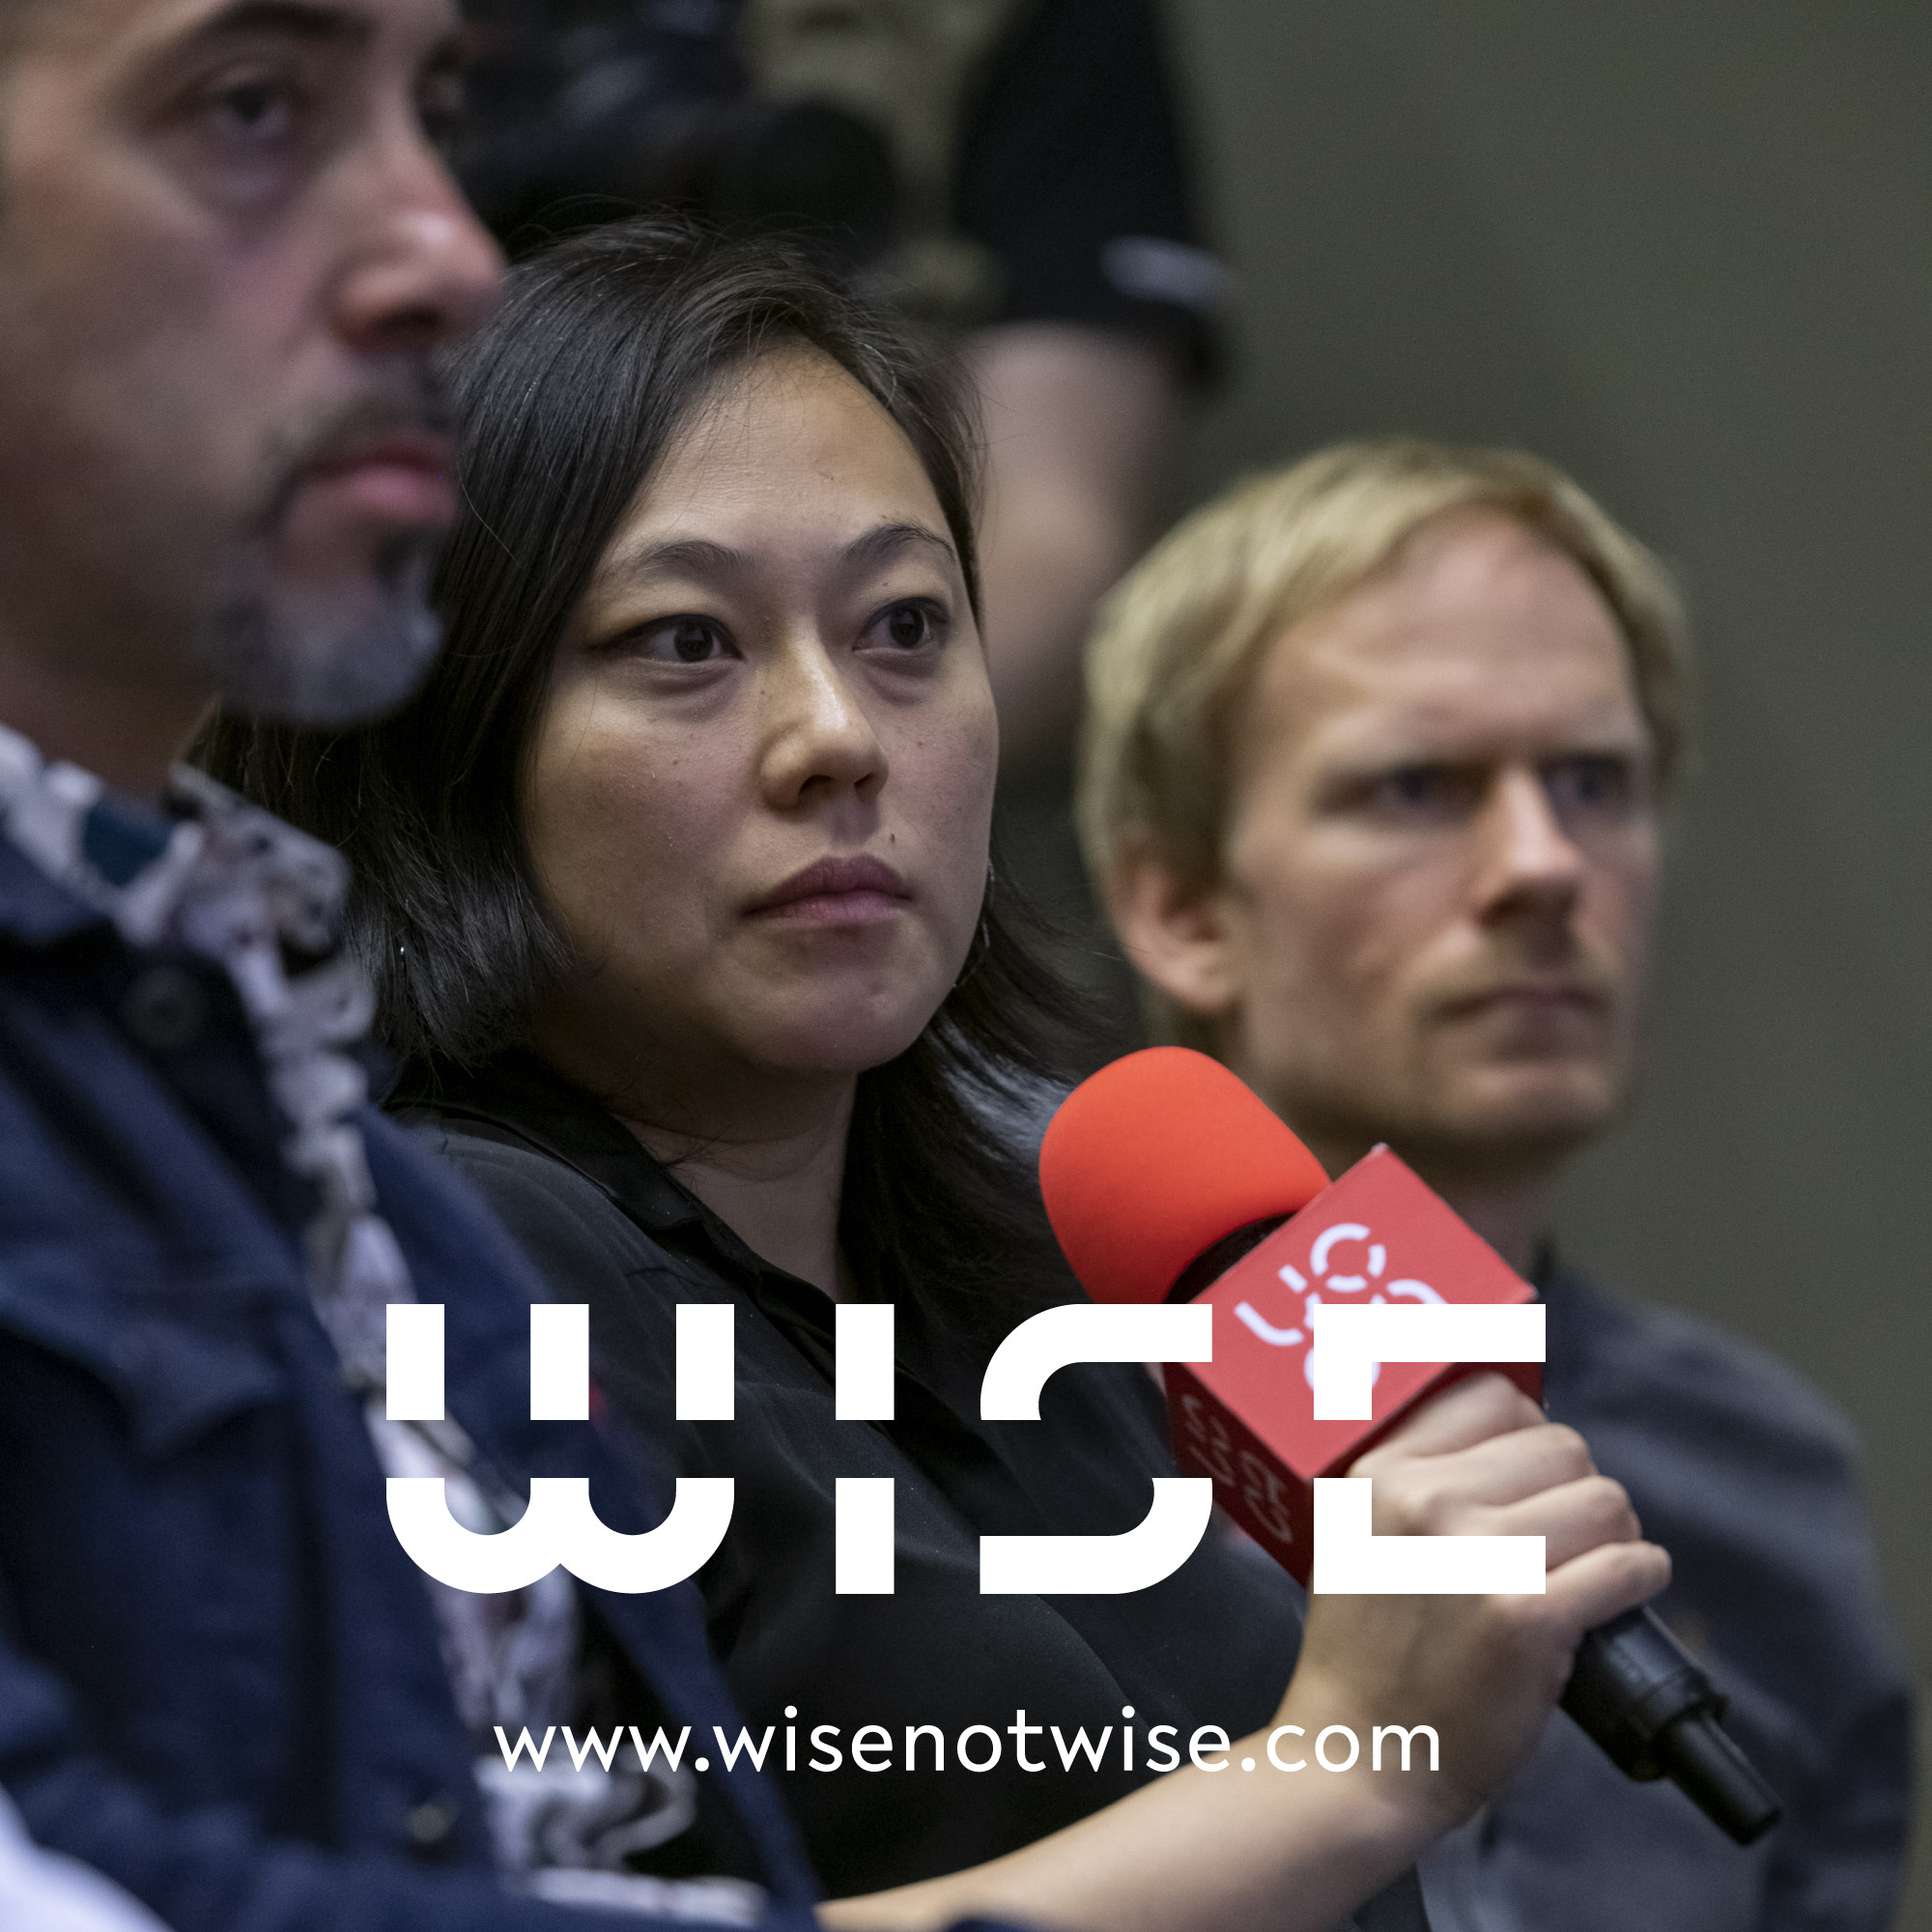 WISE_RECAP_2019_DAY_1_31.jpg